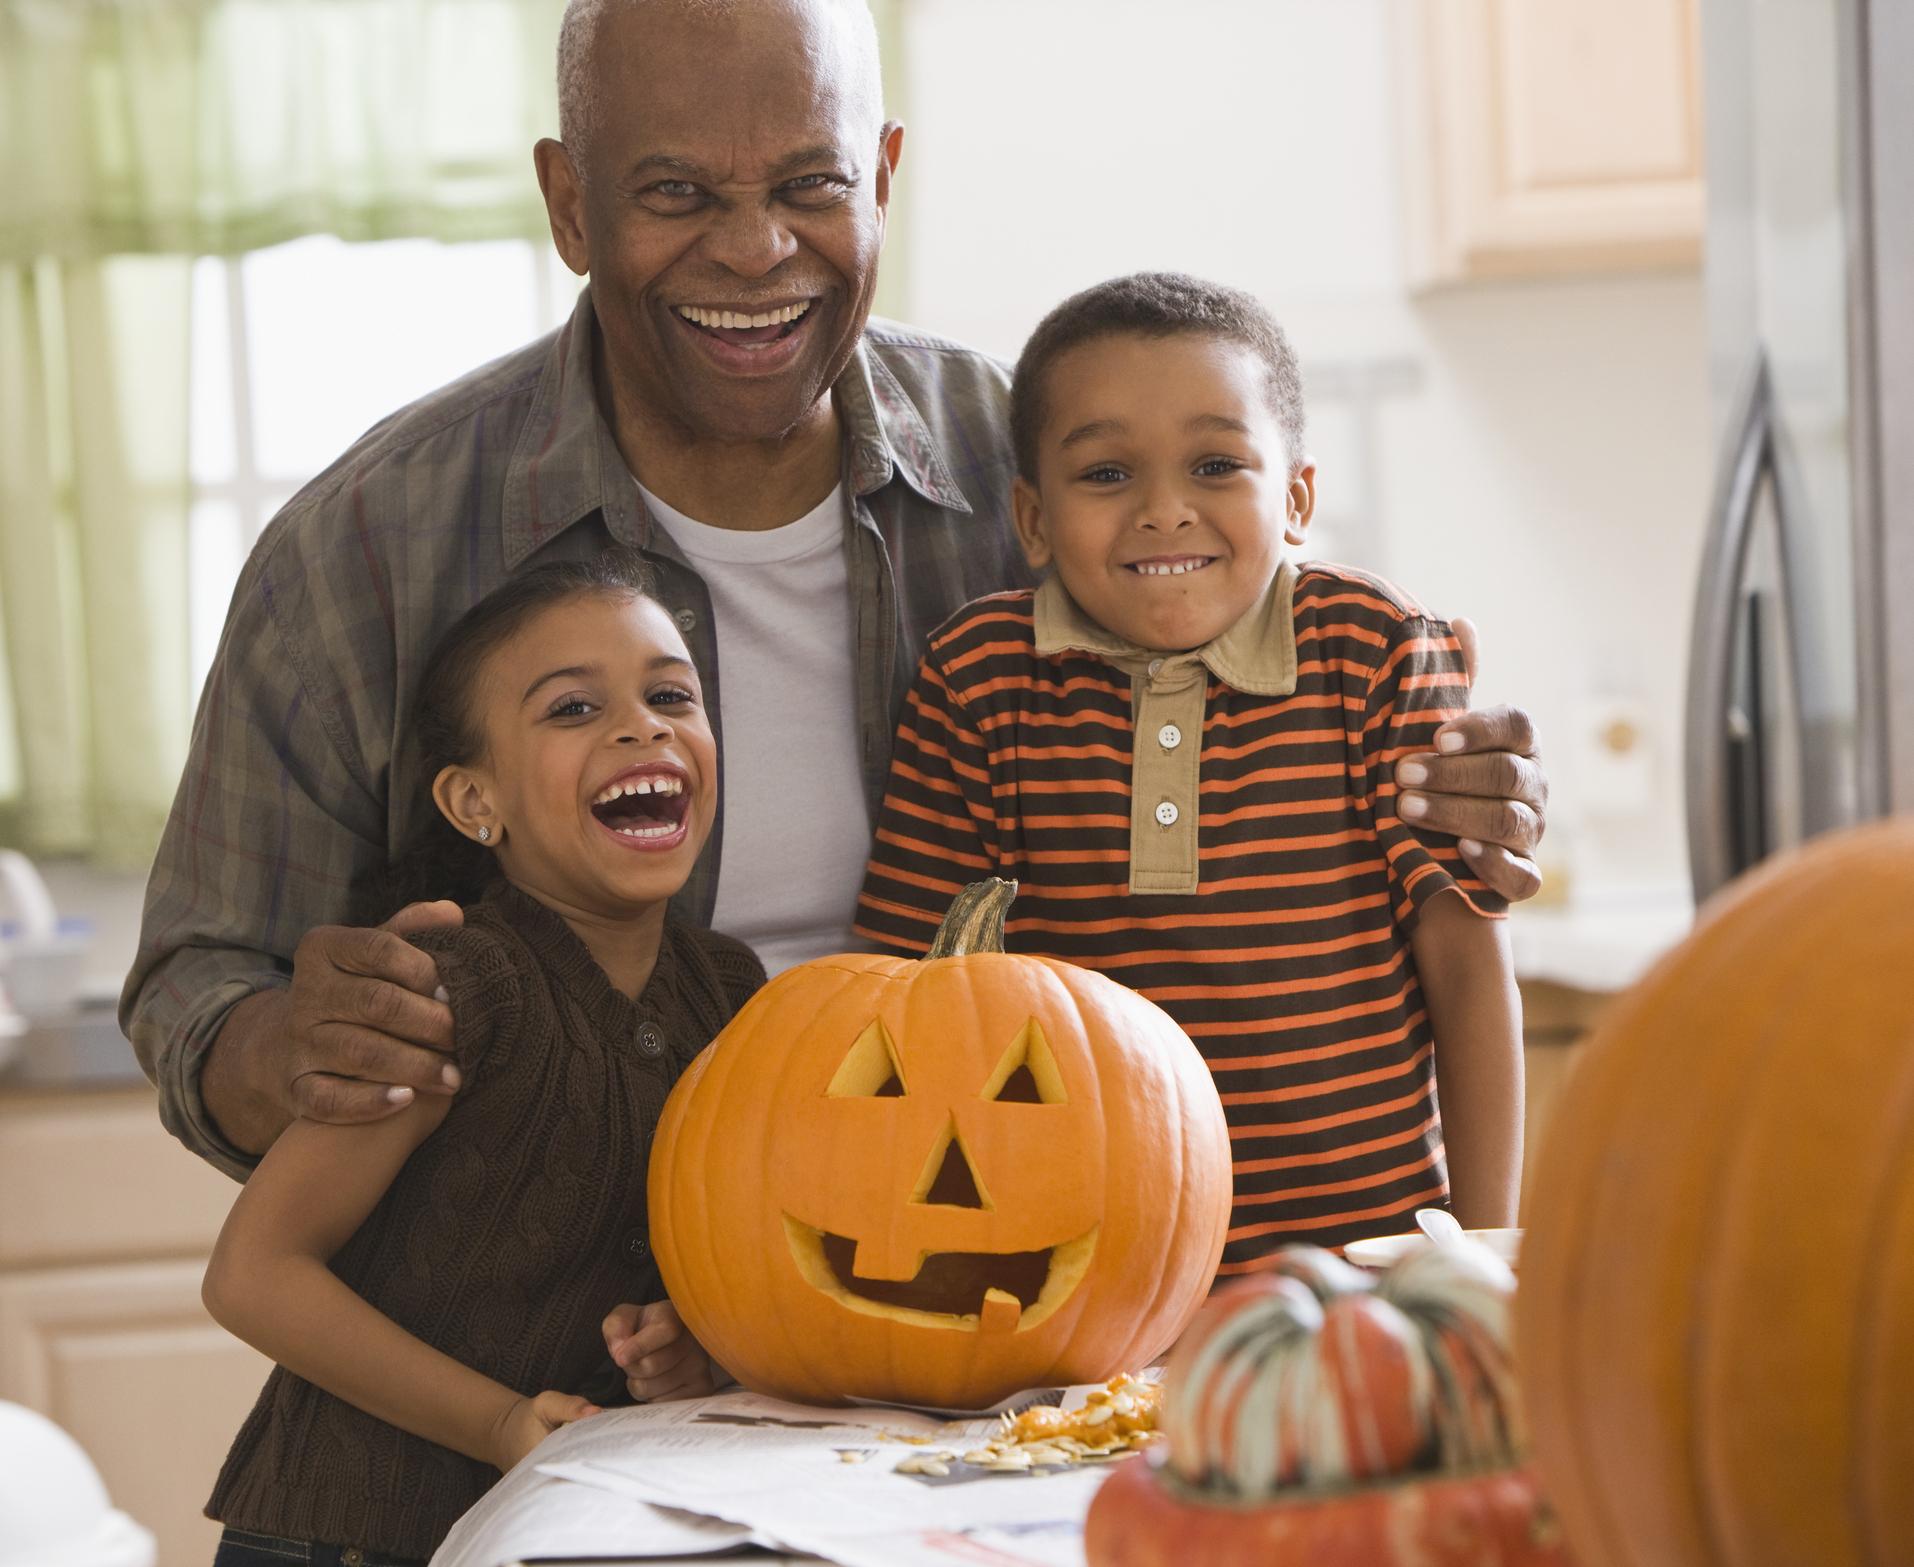 Grandfather and grandchildren carving a pumpkin